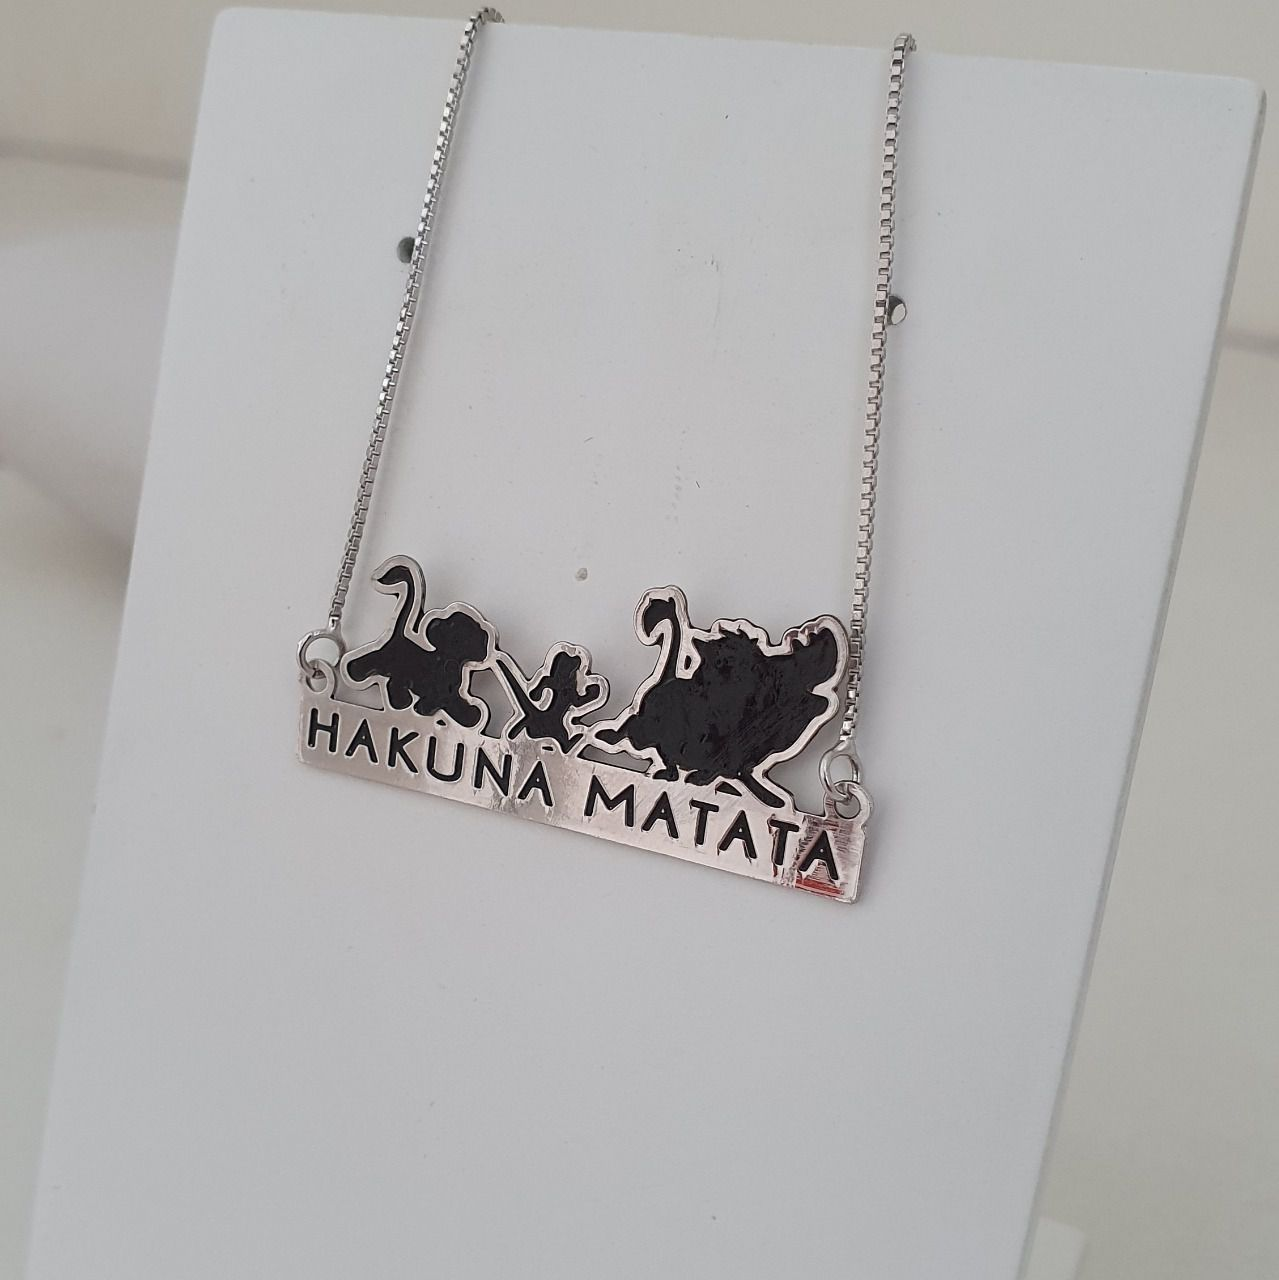 Colar Personalizado Hakuna Matata